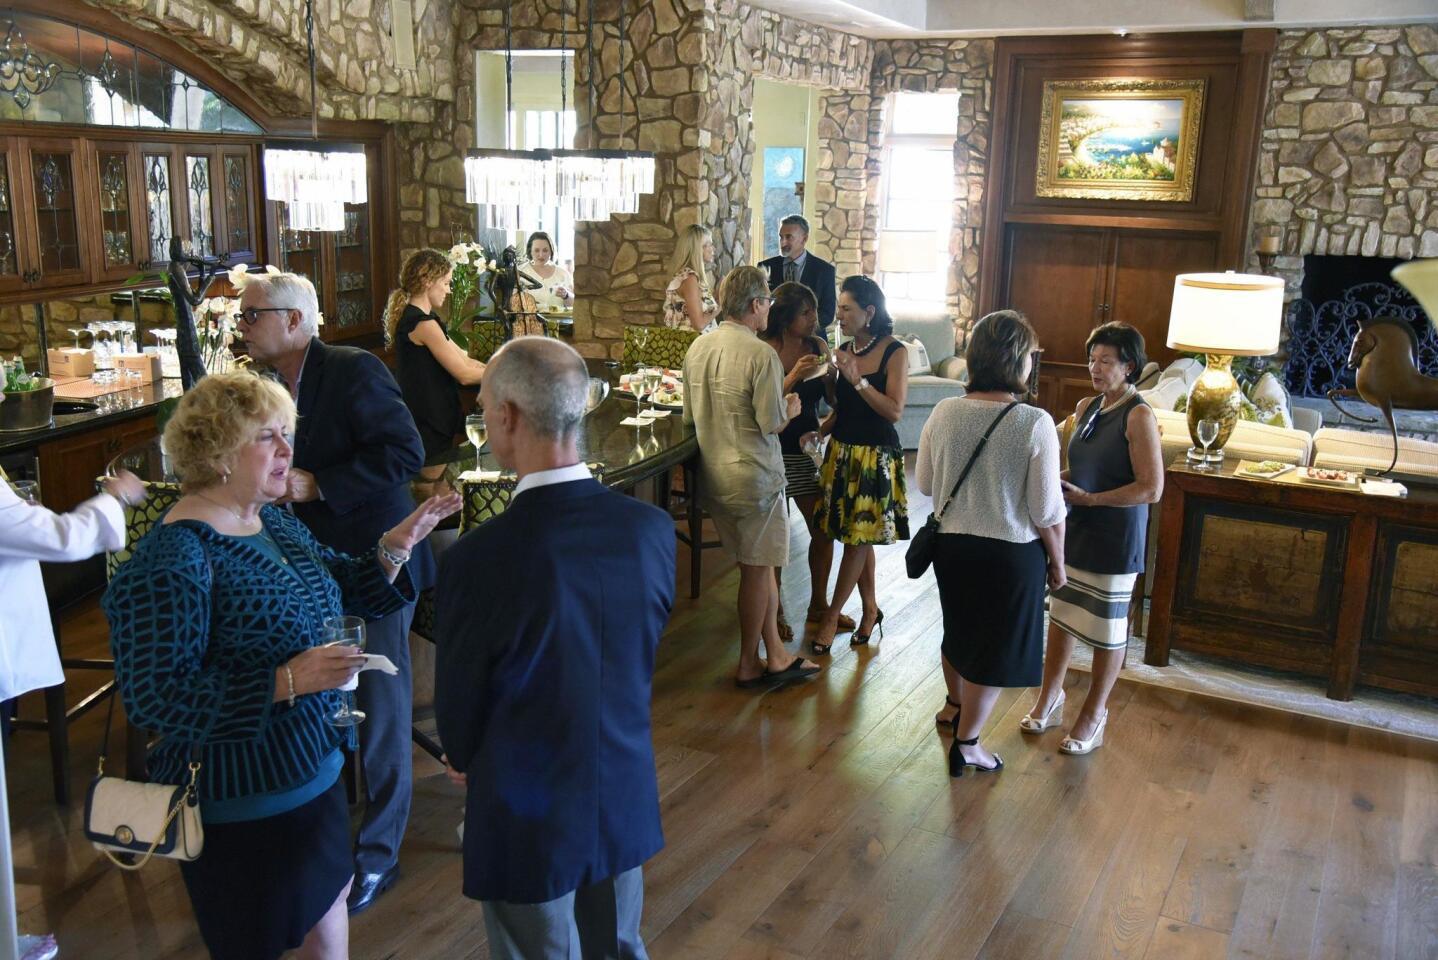 VIP reception held for La Maison De Cygnes